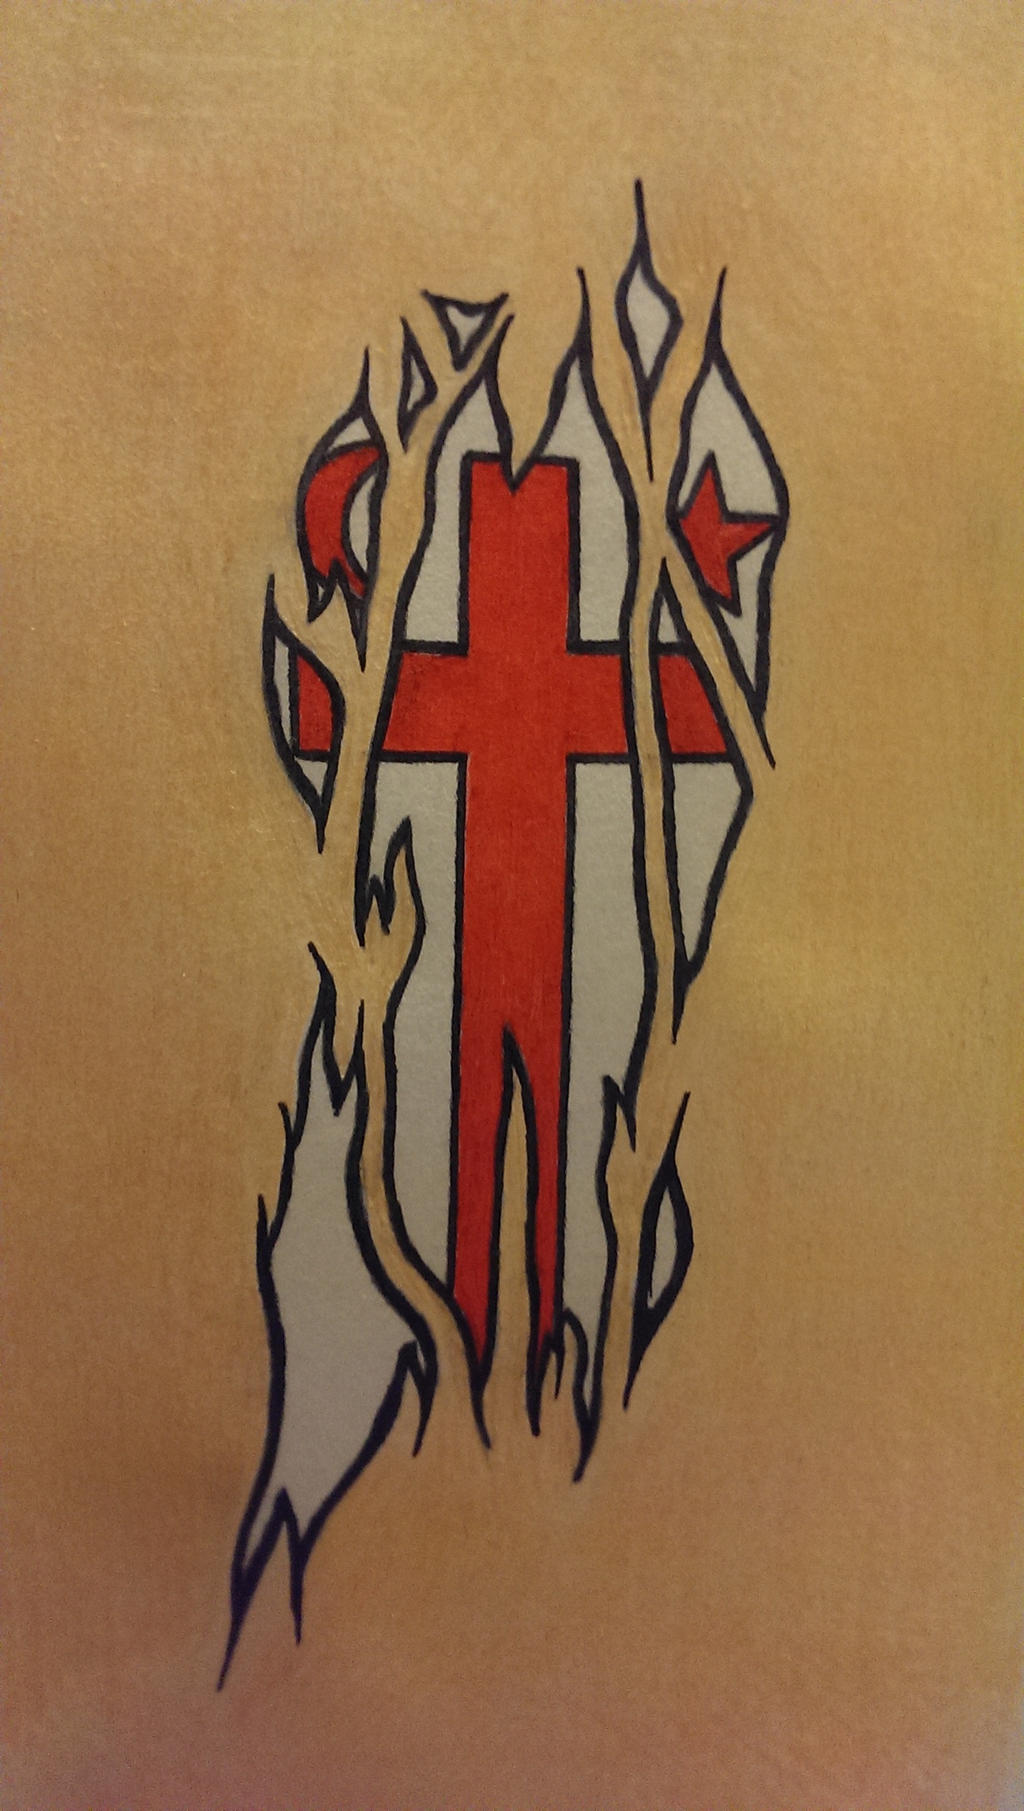 mi 39 kmaq flag tattoo design w ink colour by rodjij on deviantart. Black Bedroom Furniture Sets. Home Design Ideas